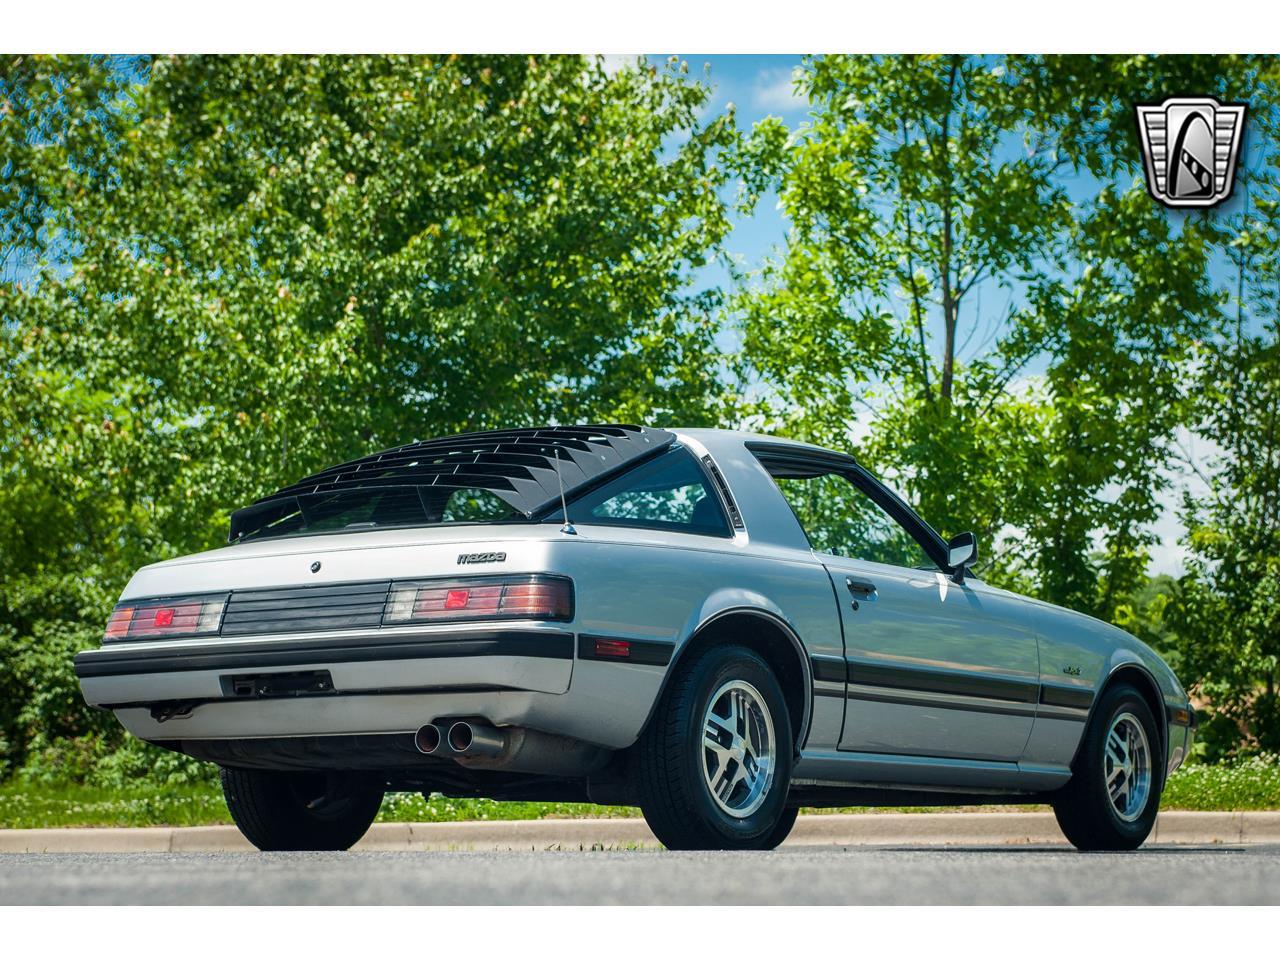 Large Picture of 1982 RX-7 located in O'Fallon Illinois - $14,500.00 - QB9V